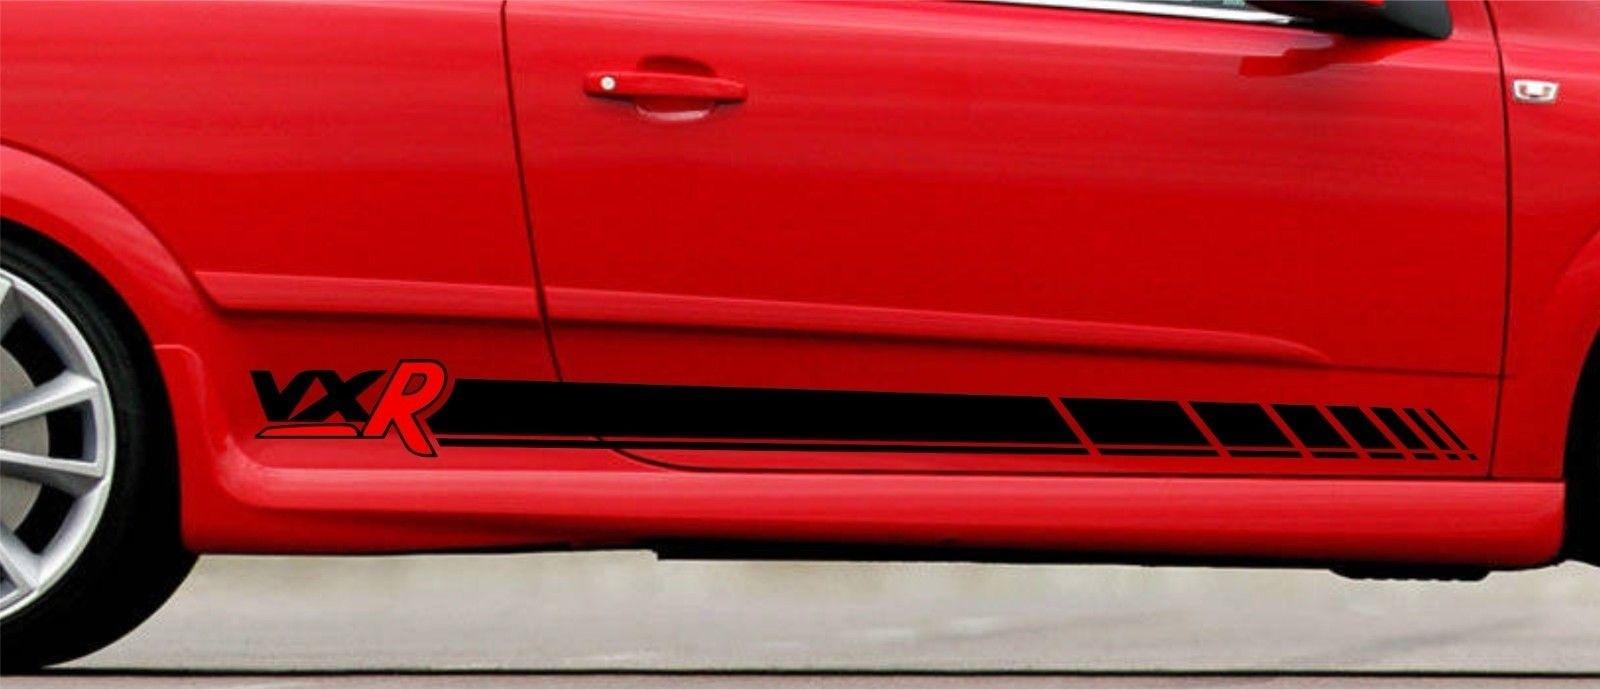 New Vauxhall Nova 1.6 GSI CAT Genuine Delphi Master Brake Cylinder